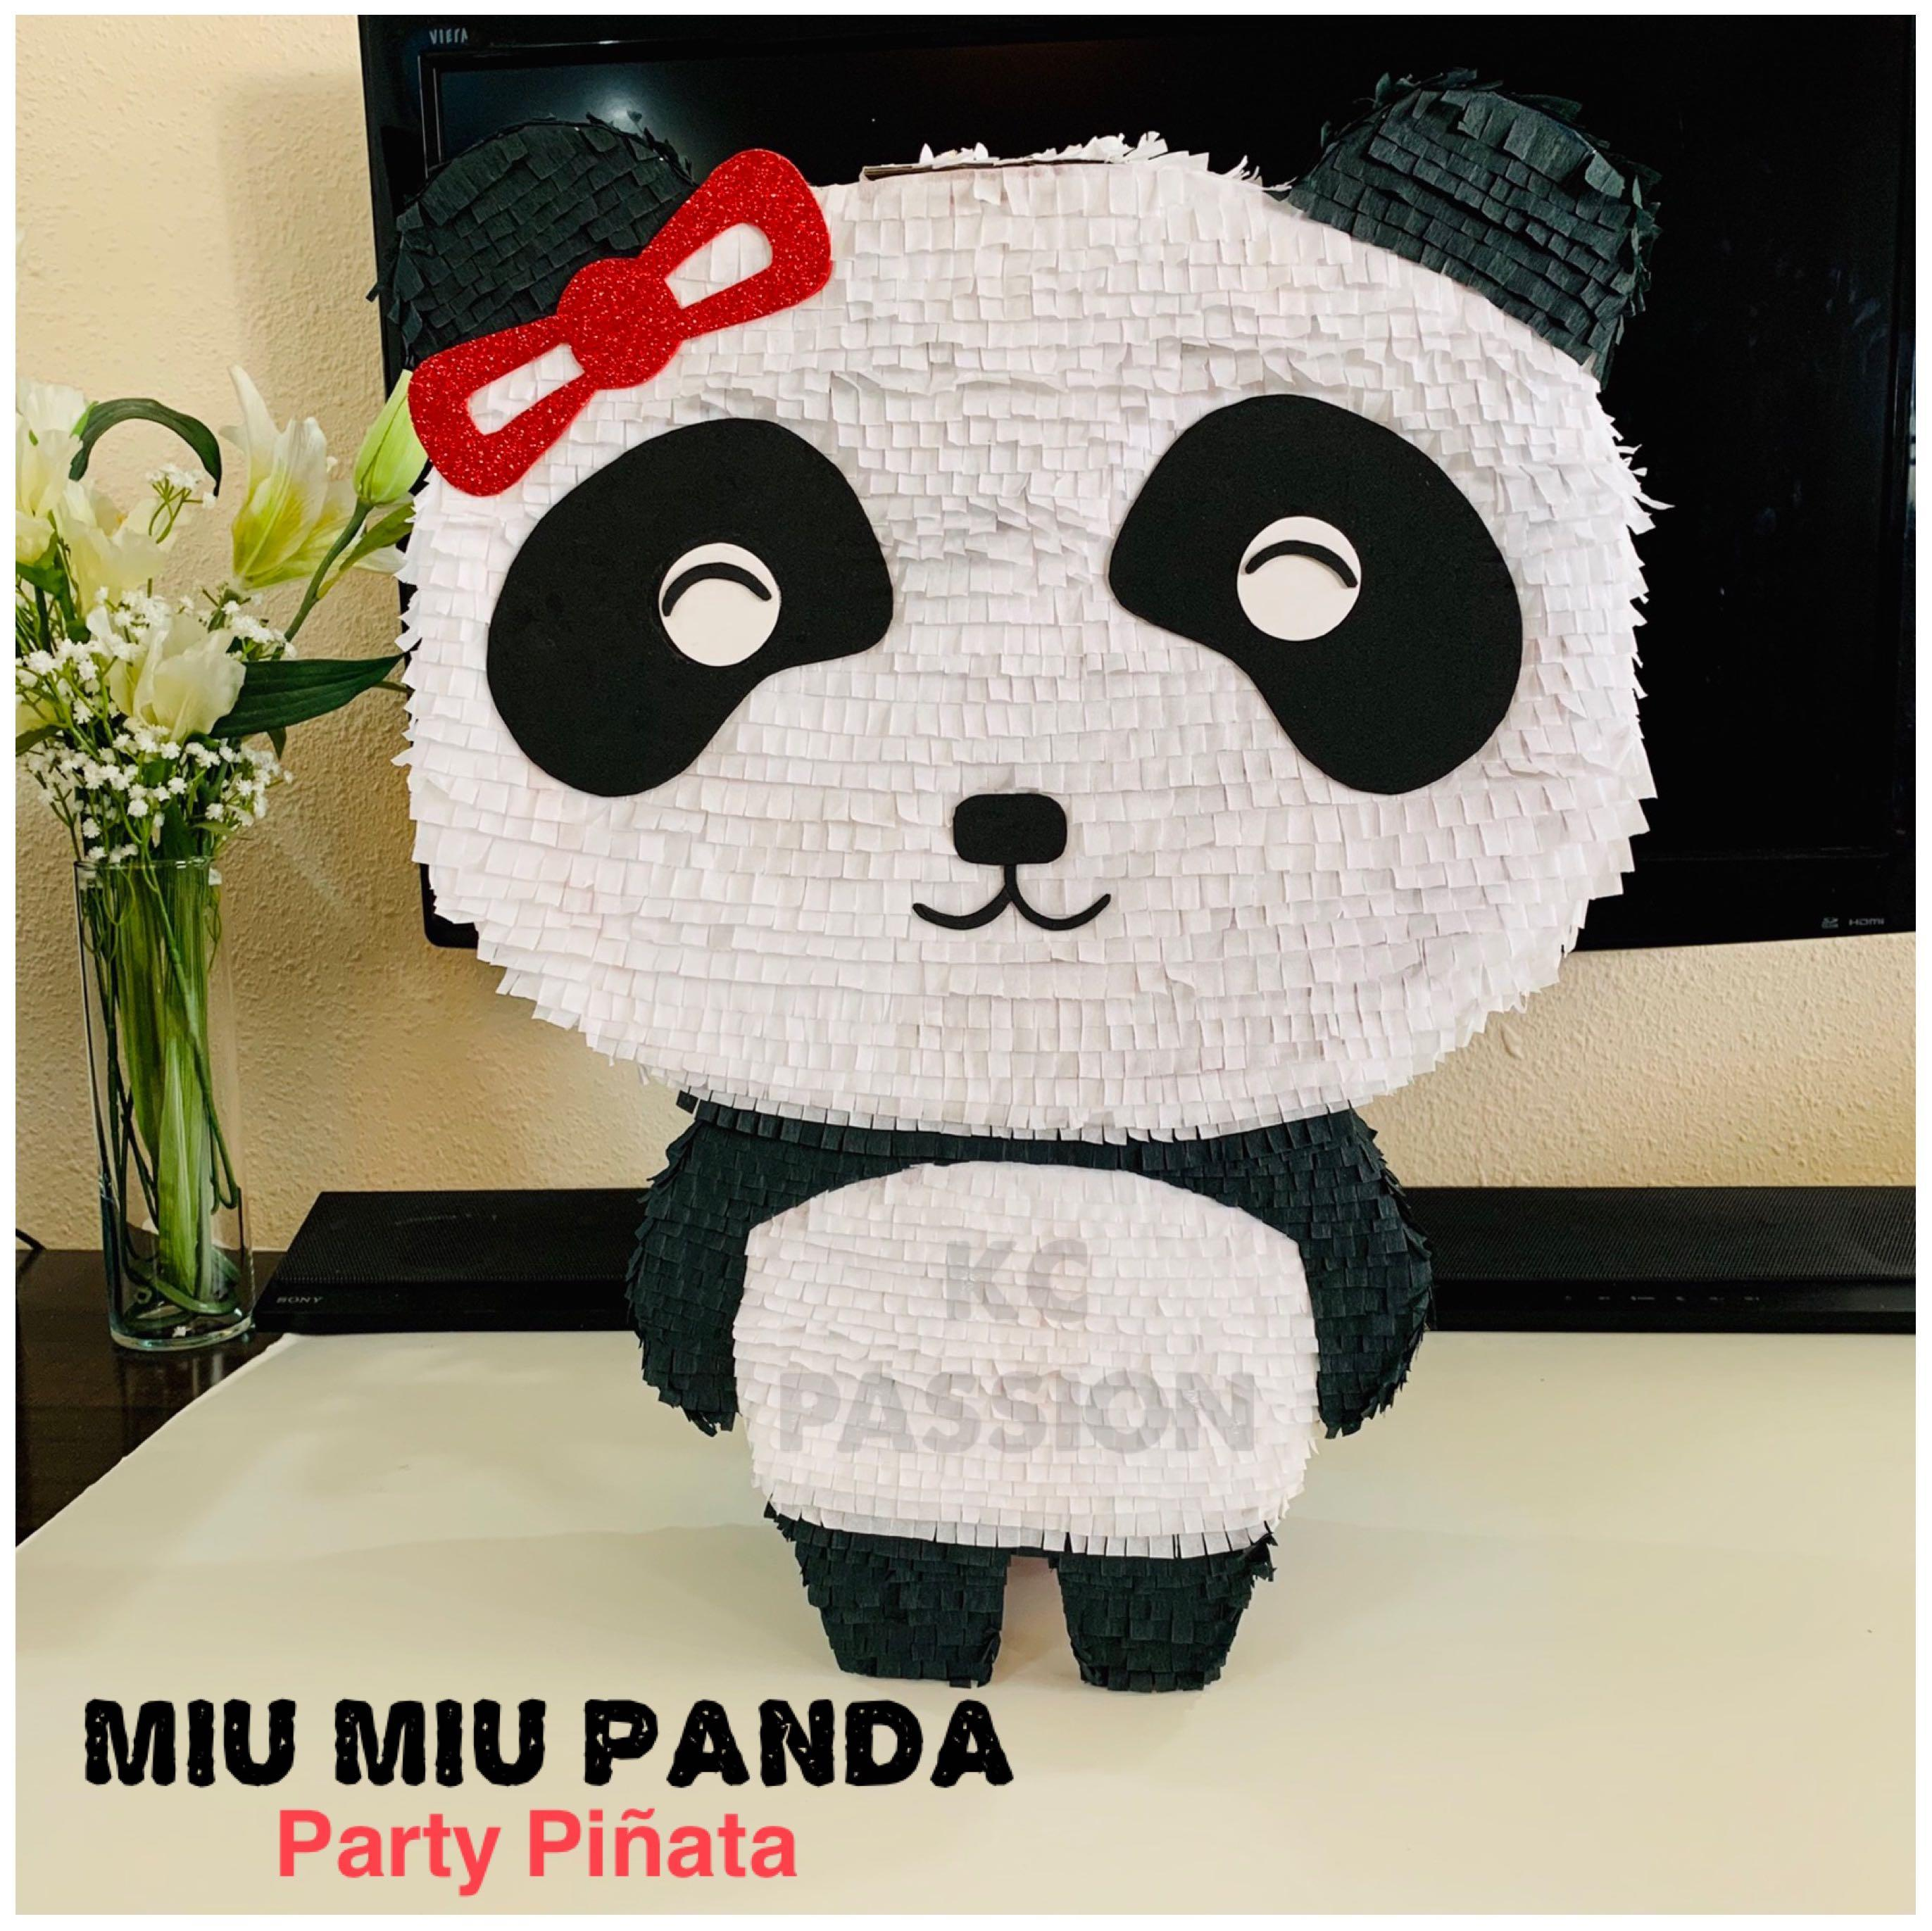 🐼 PANDA [Kiki and Miu Miu] PARTY PIÑATA • PINATA Customized